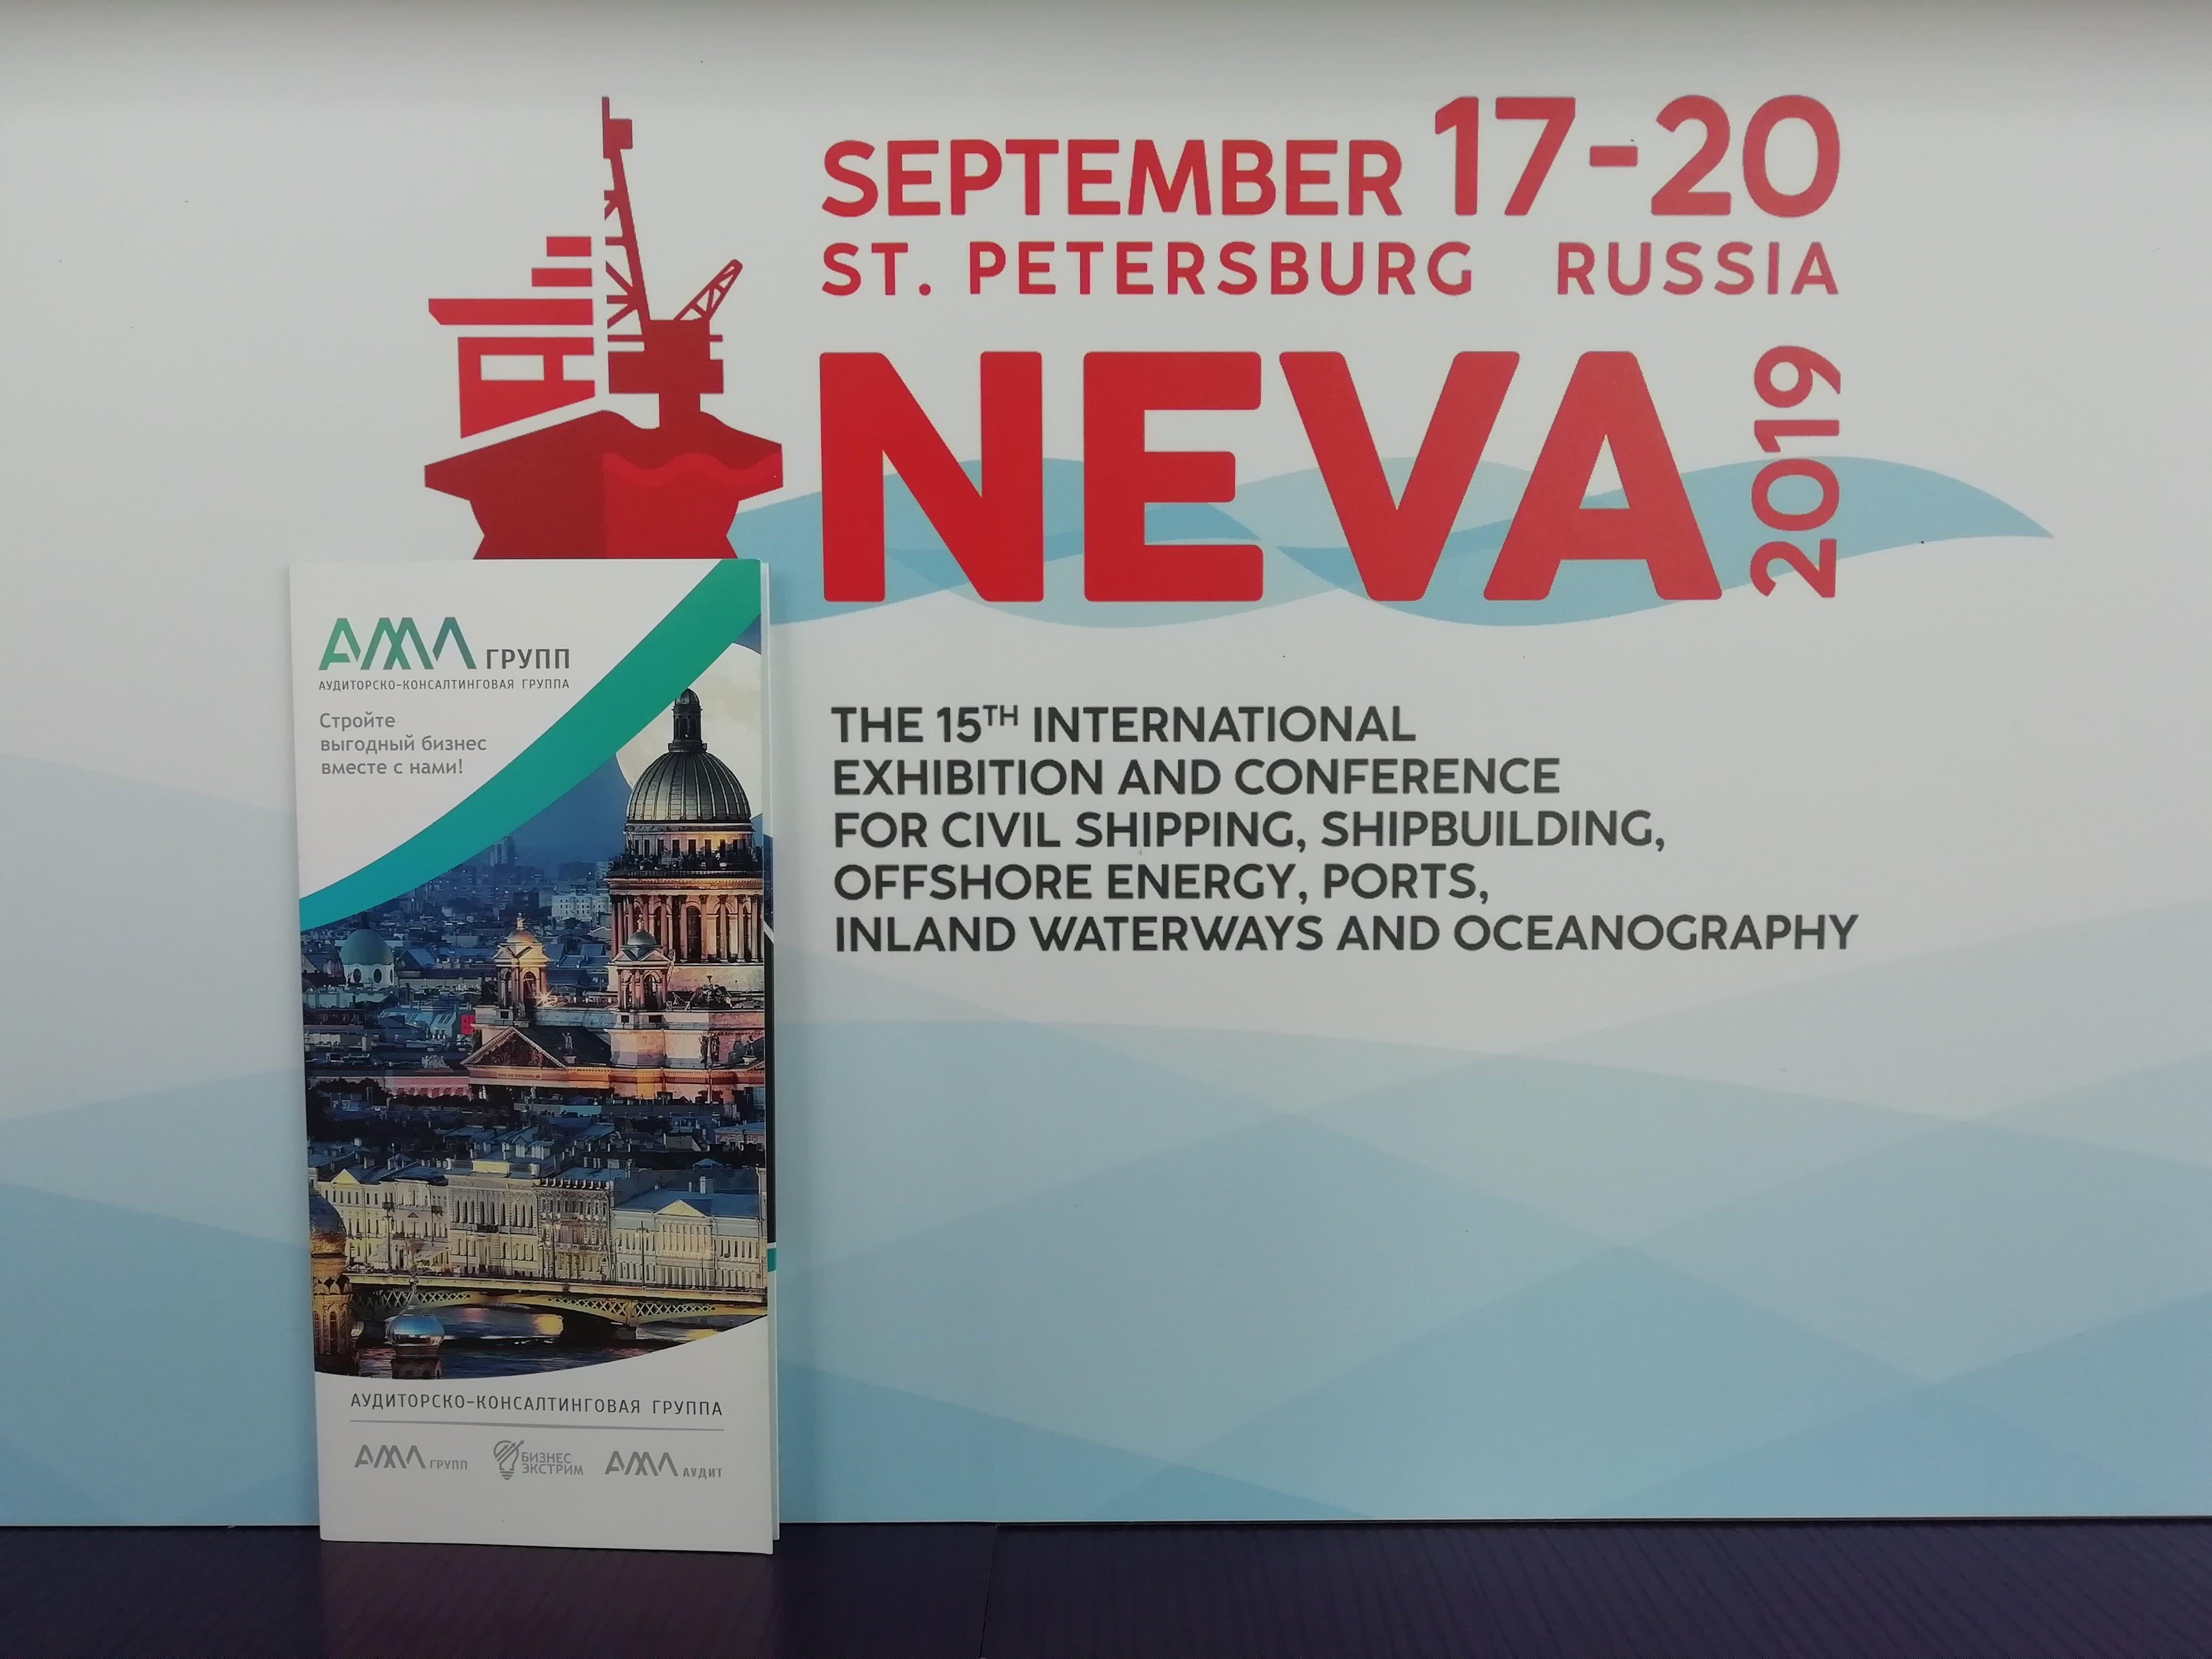 АМЛ Групп на выставке НЕВА 2019, нева 2019, выставка, санкт-петербург, амл групп